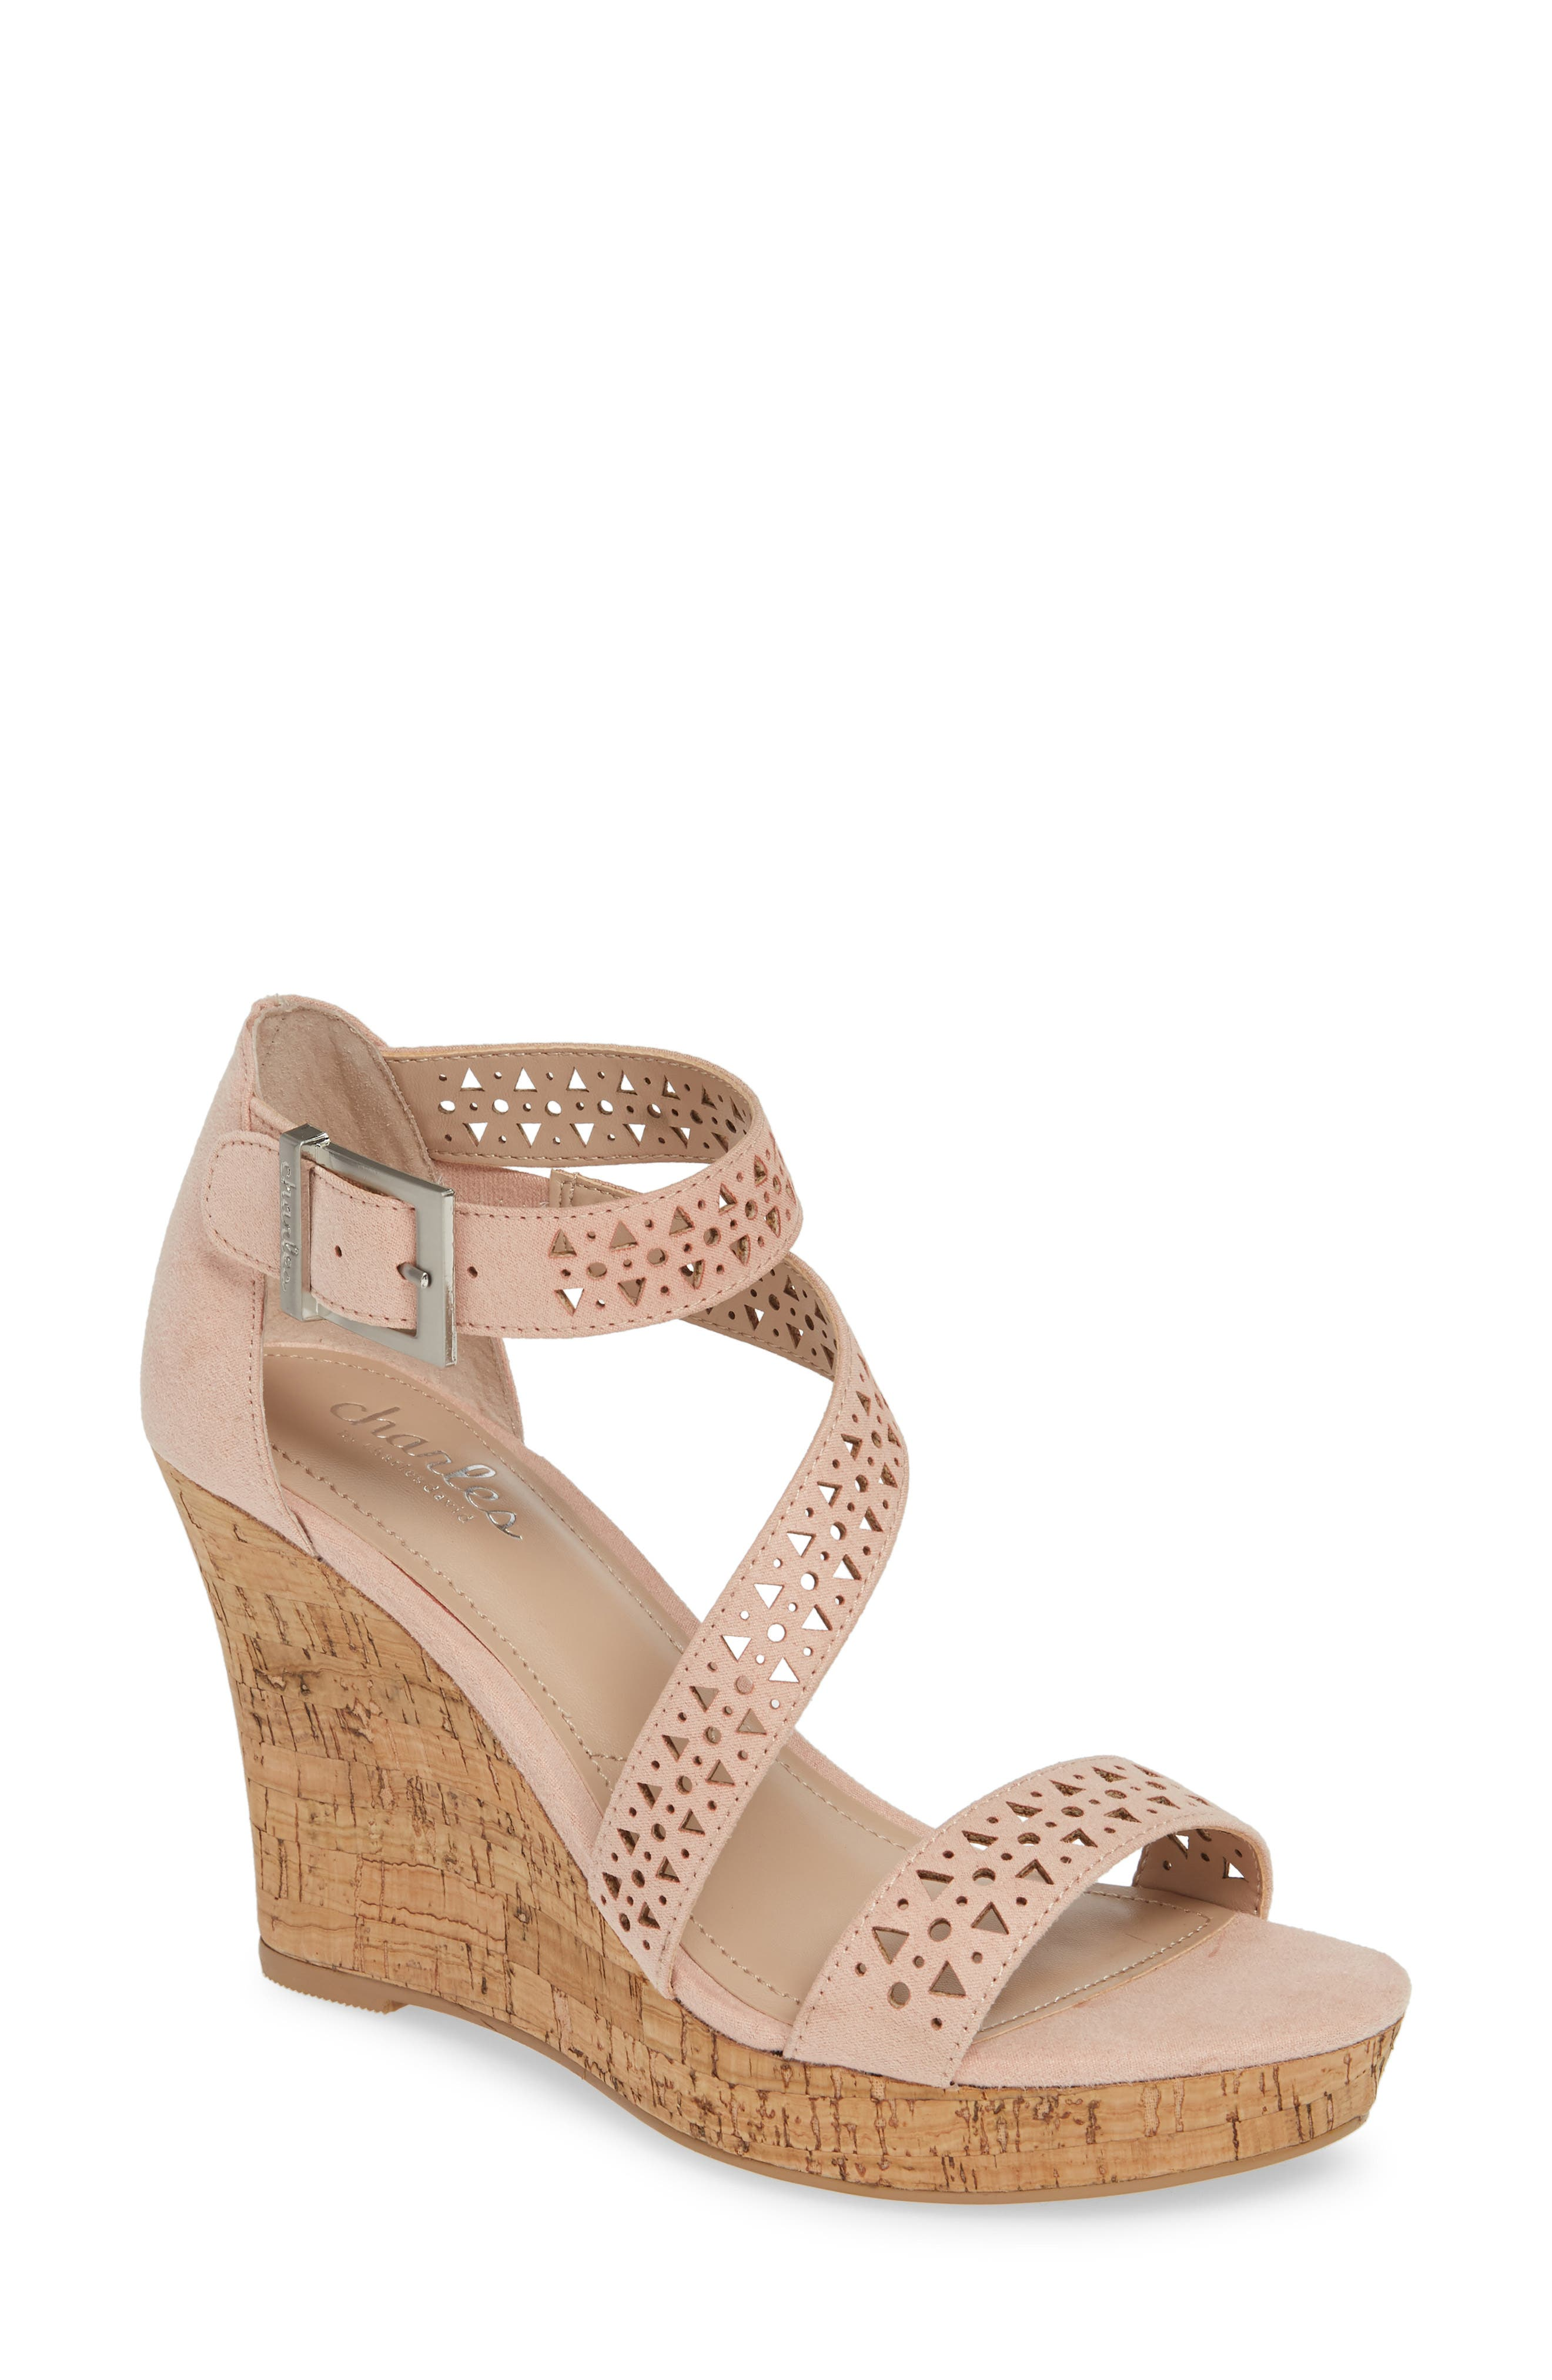 Charles By Charles David Landon Perforated Wedge Sandal- Pink